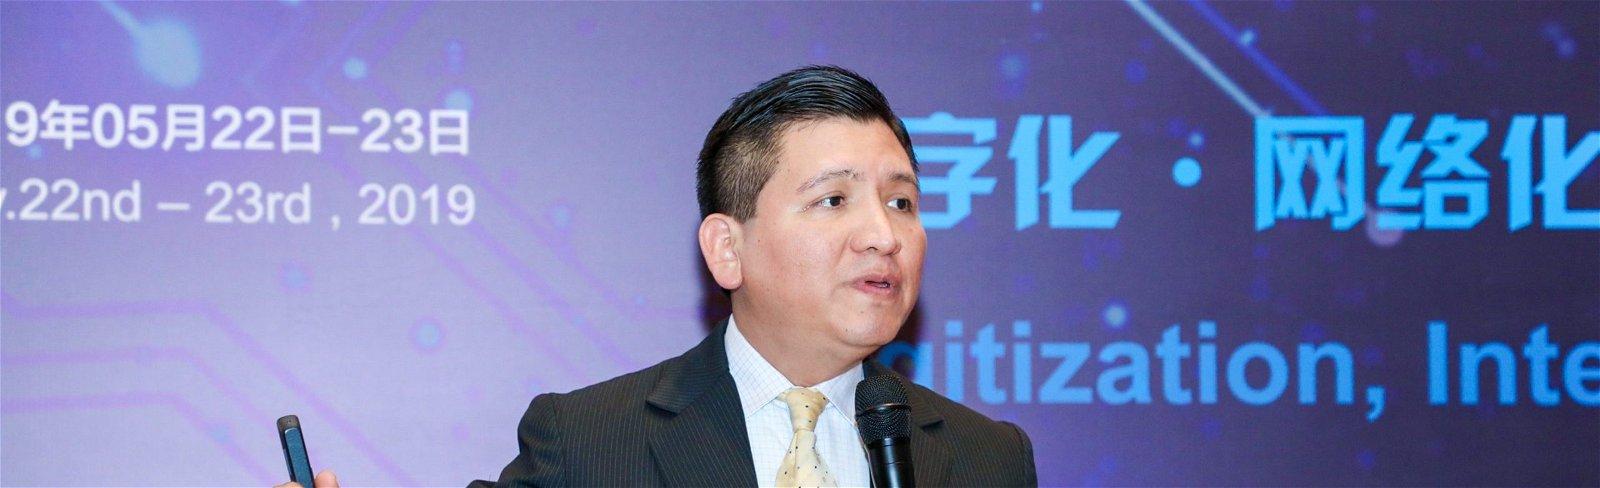 Edgar Perez presenting